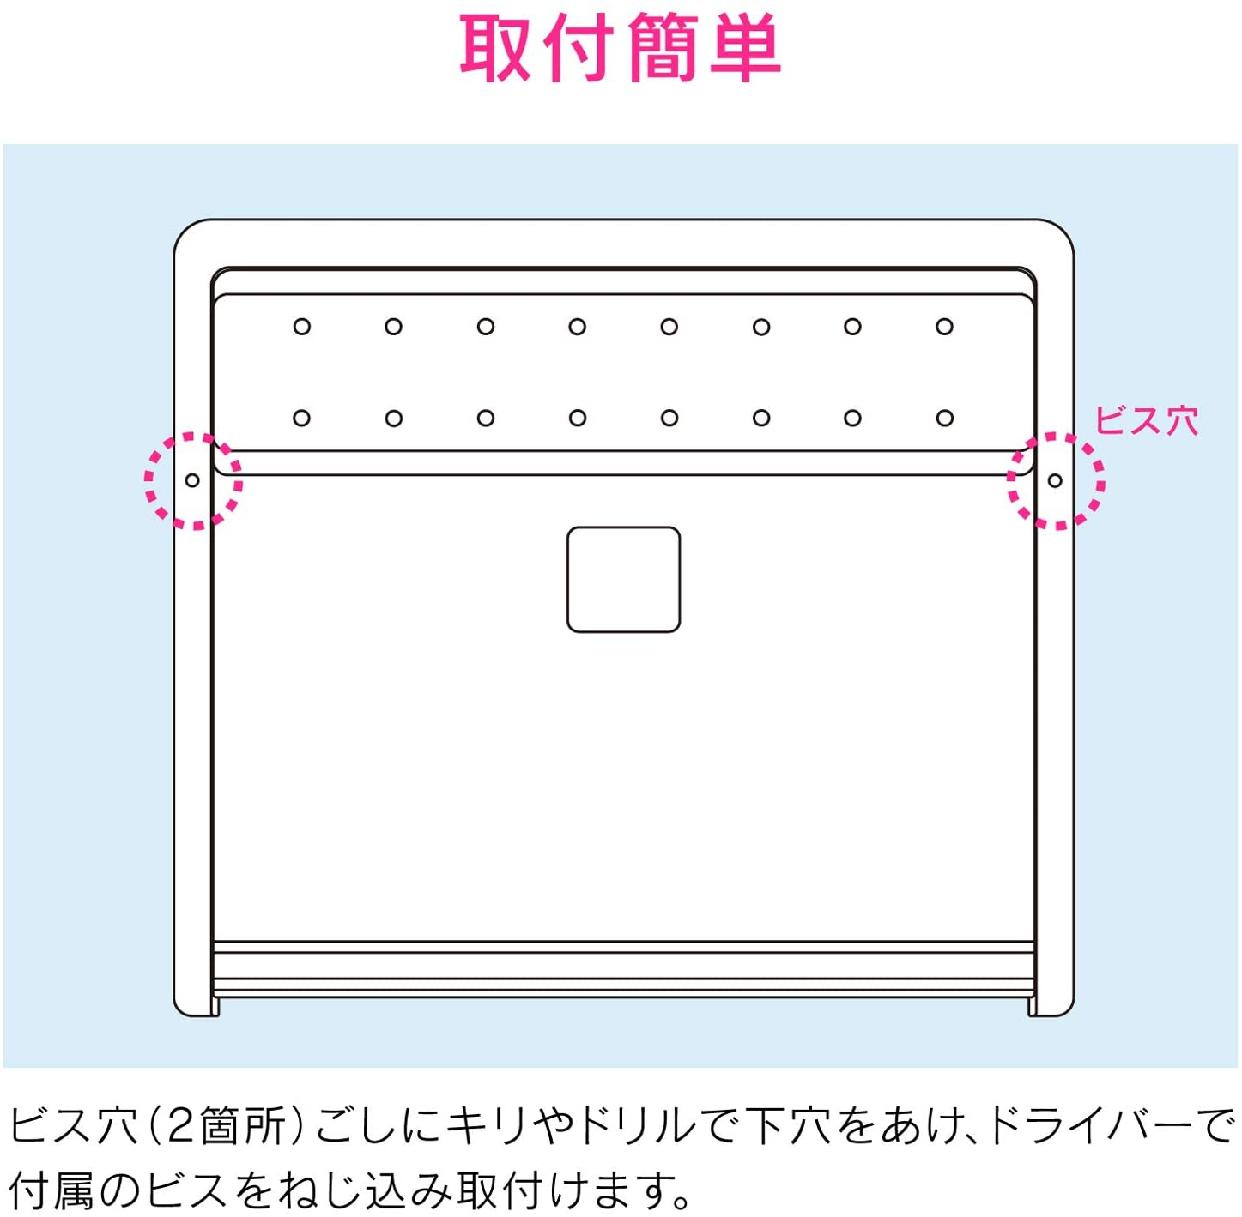 GAONA(ガオナ) 立型包丁差し ホワイト GA-PF022の商品画像4